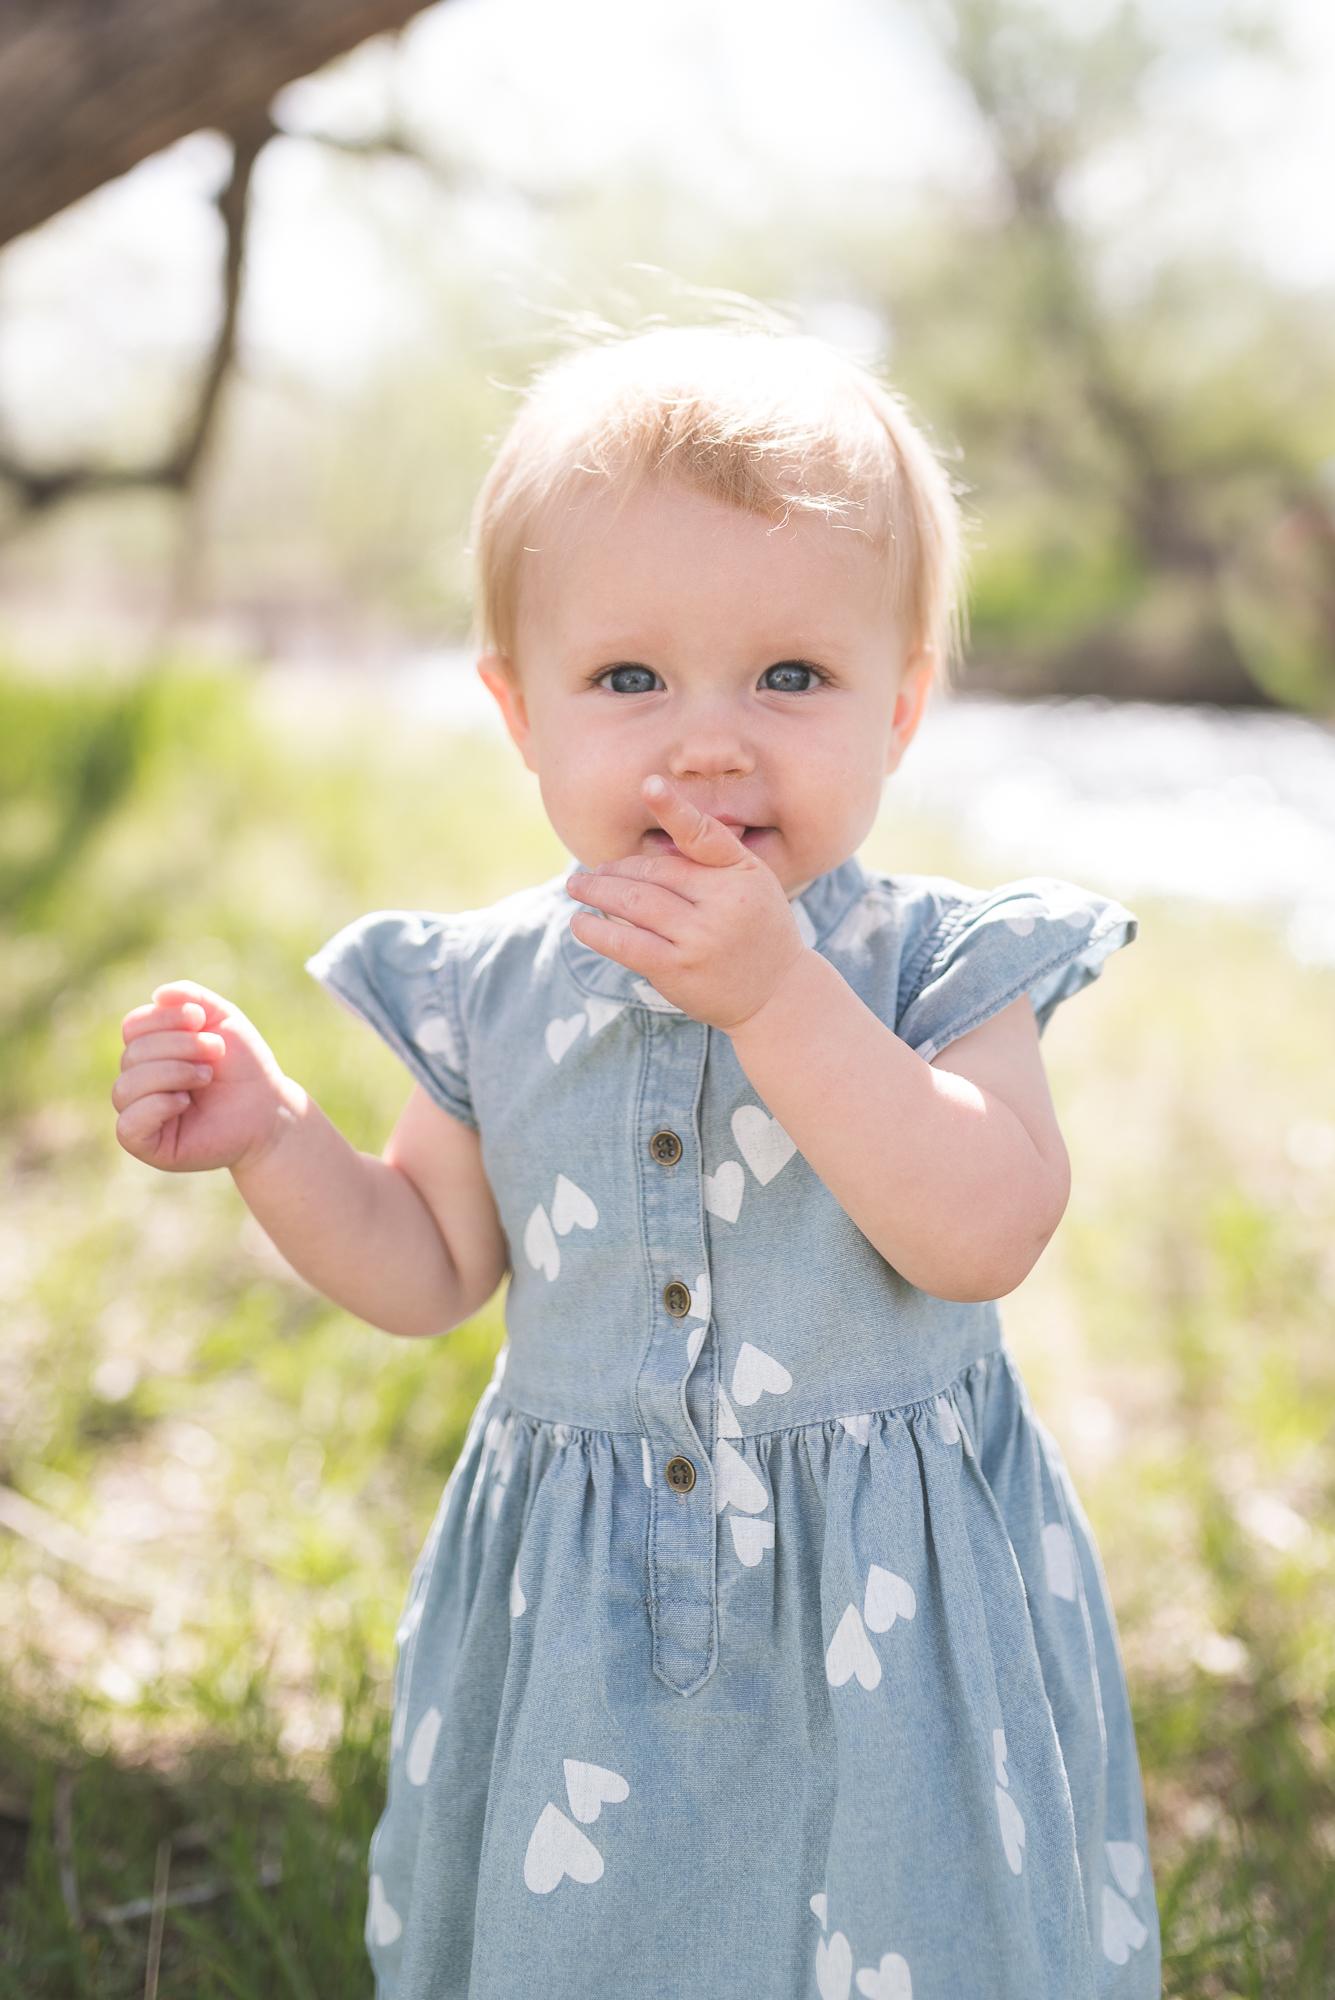 Denver+Boulder+Lifestyle+Family+Photographer+MiniSessions+JennyFolmanPhotography-2.jpg